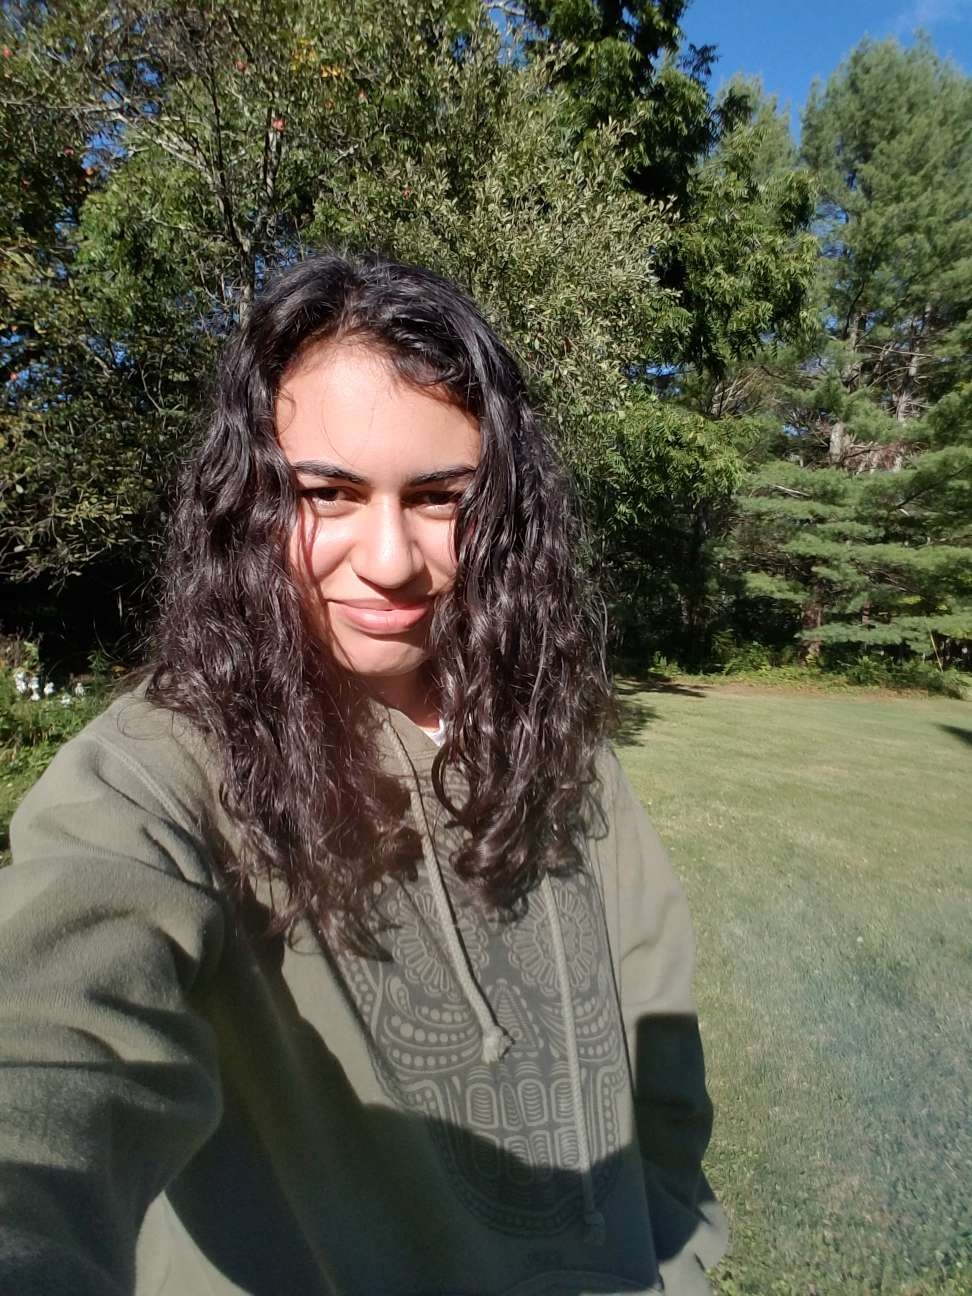 Cindy Jimenez's profile image